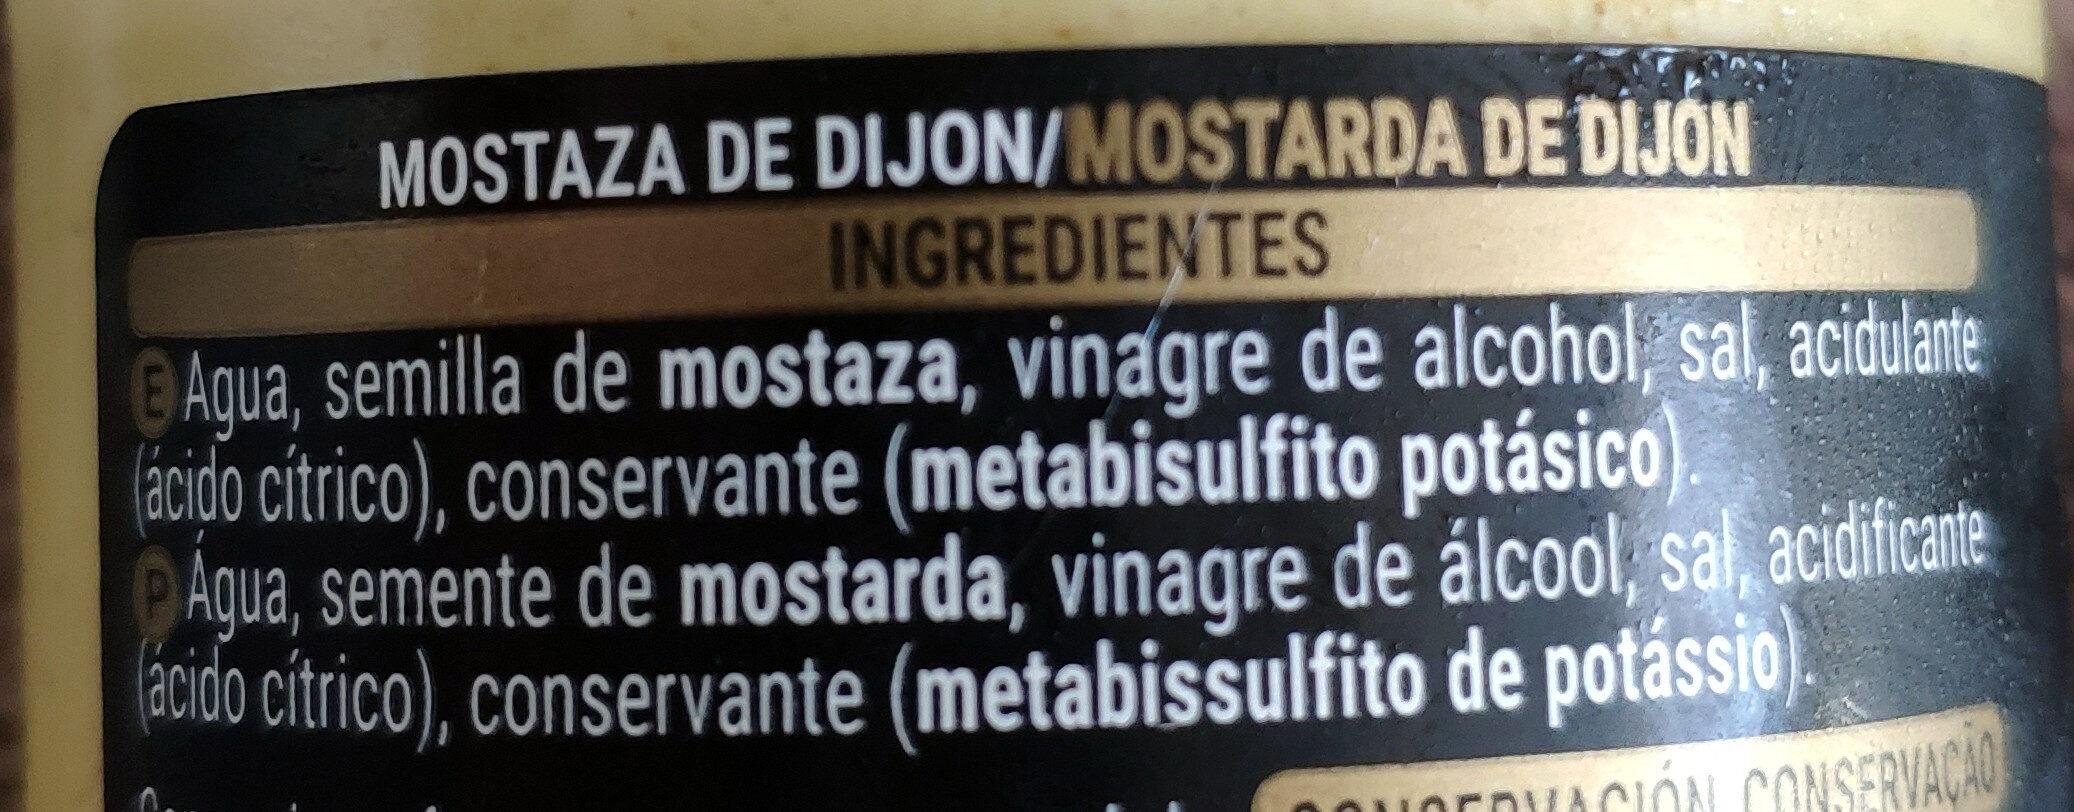 Mostaza dijon - Ingredients - es